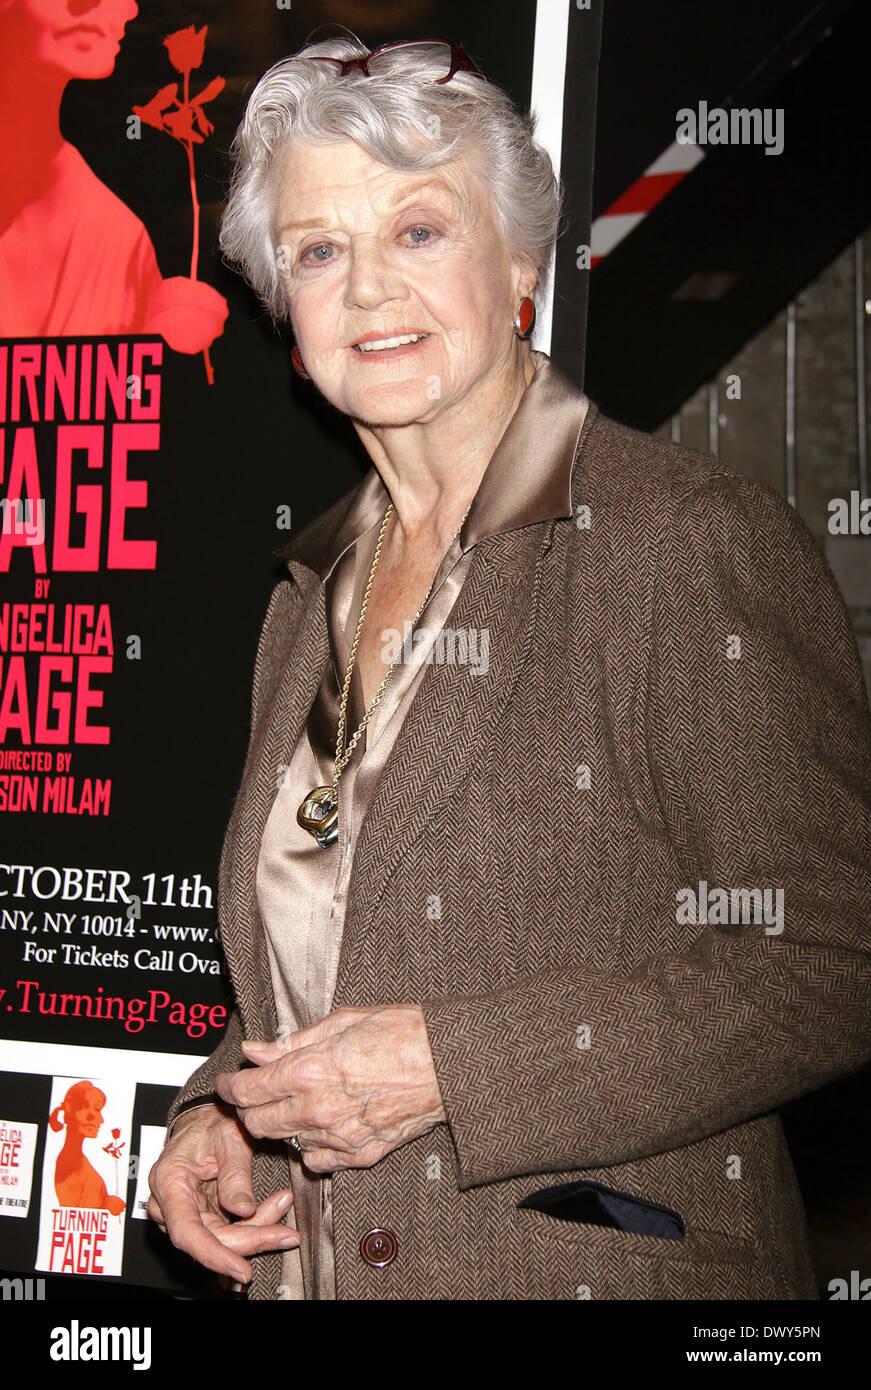 Angela Lansbury plays